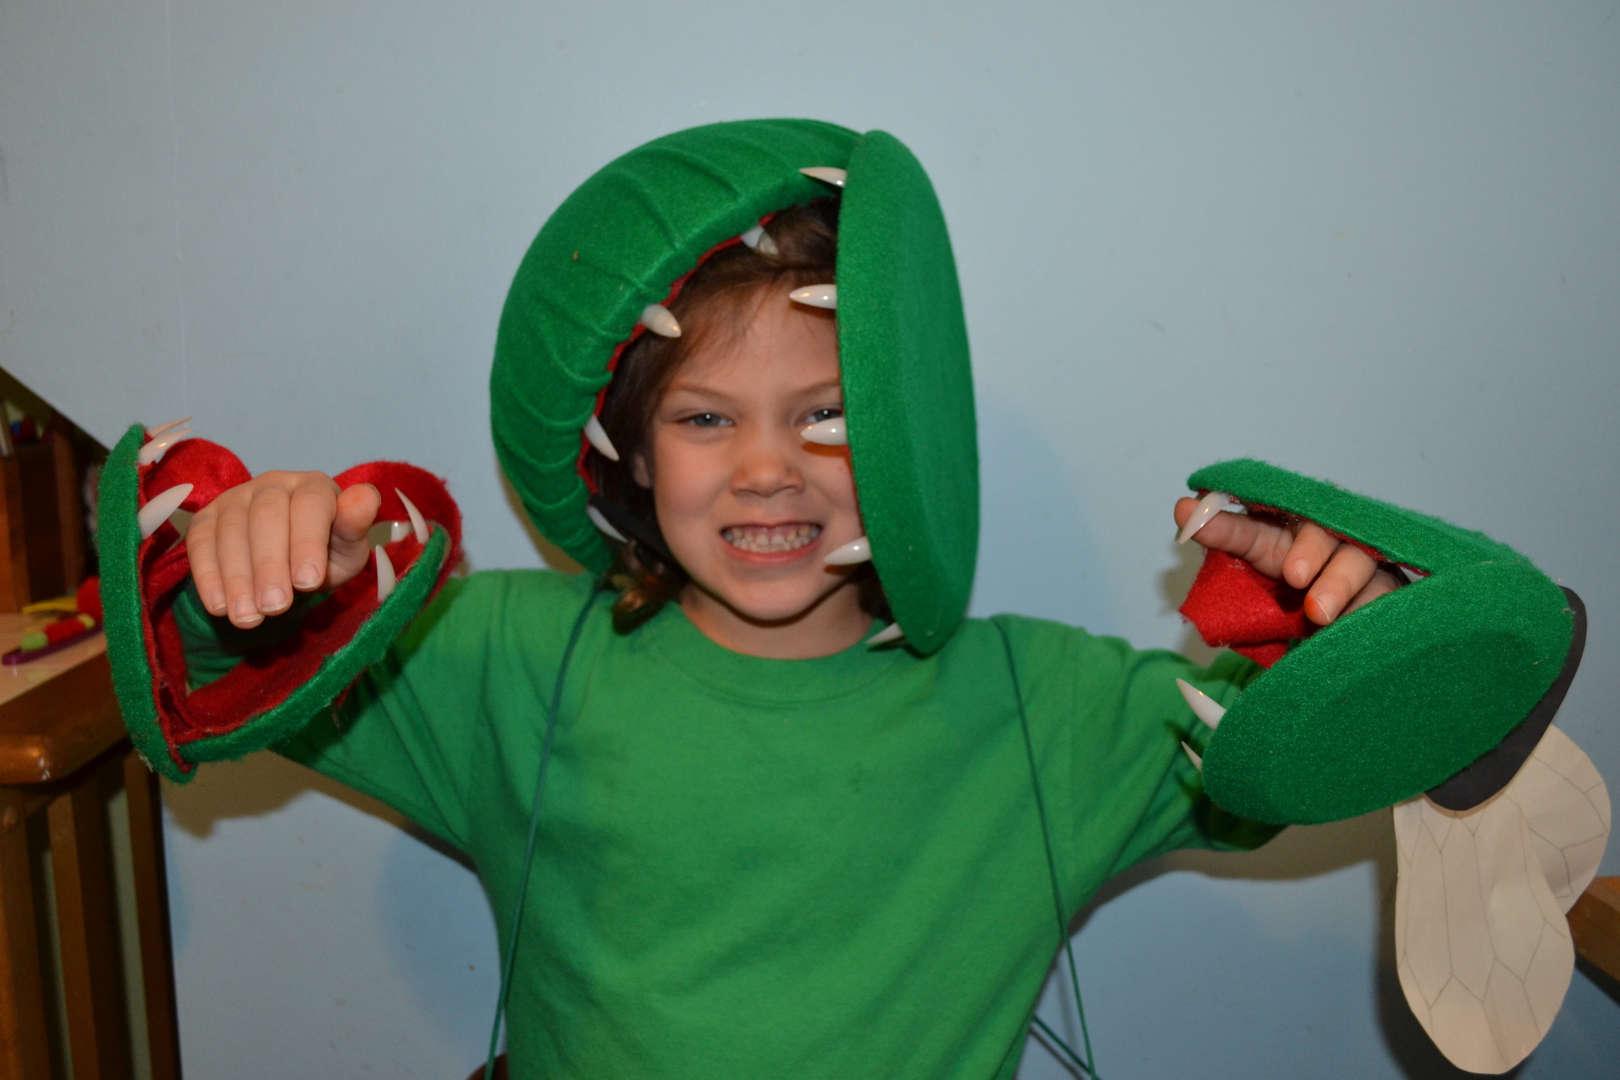 this girl looks like a venus flytrap plant